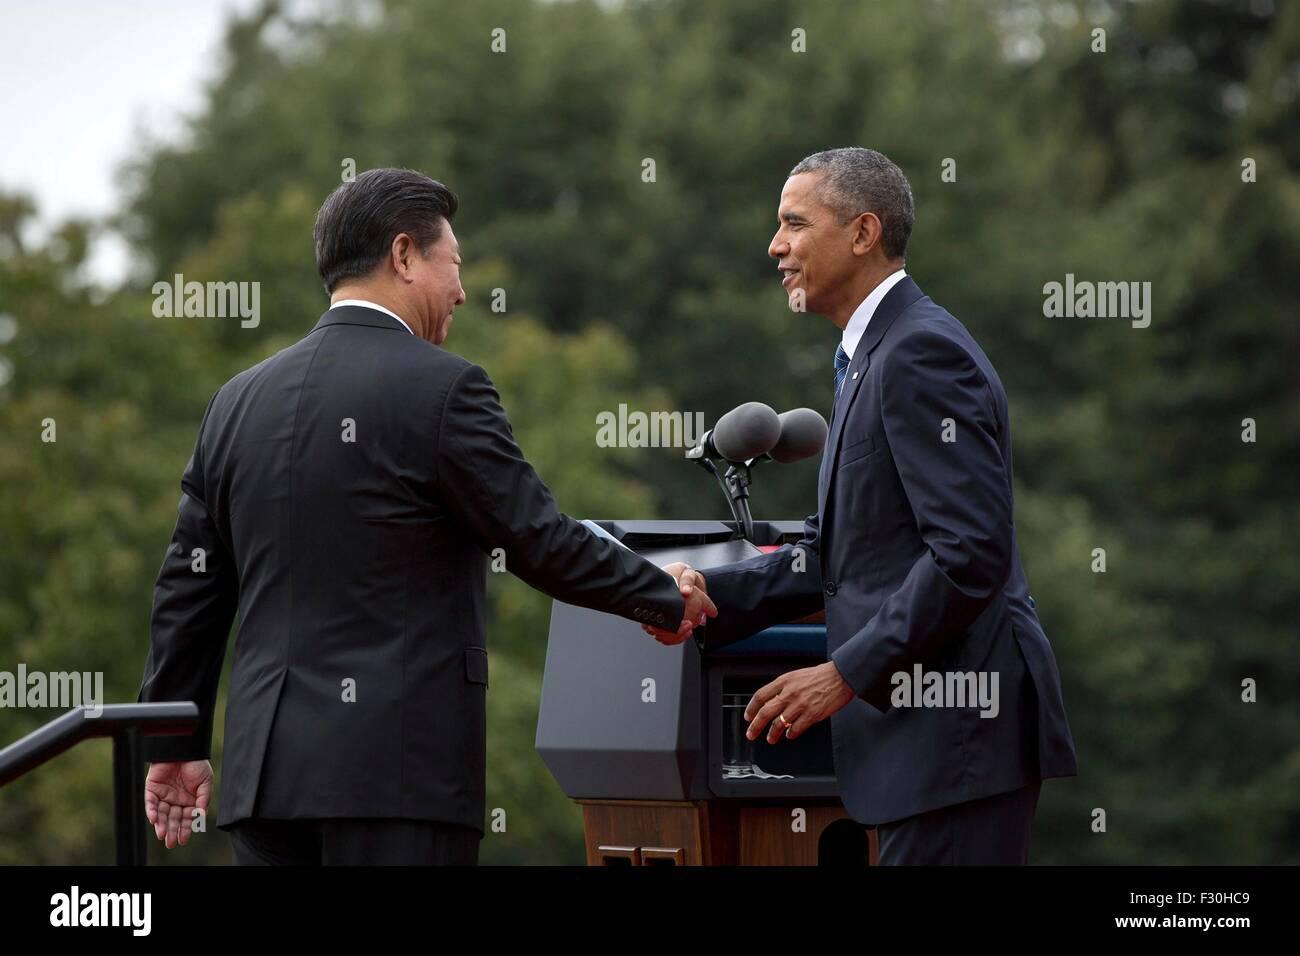 Washington DC, US. 25th Sep, 2015. U.S. President Barack Obama welcomes Chinese President Xi Jinping during the - Stock Image